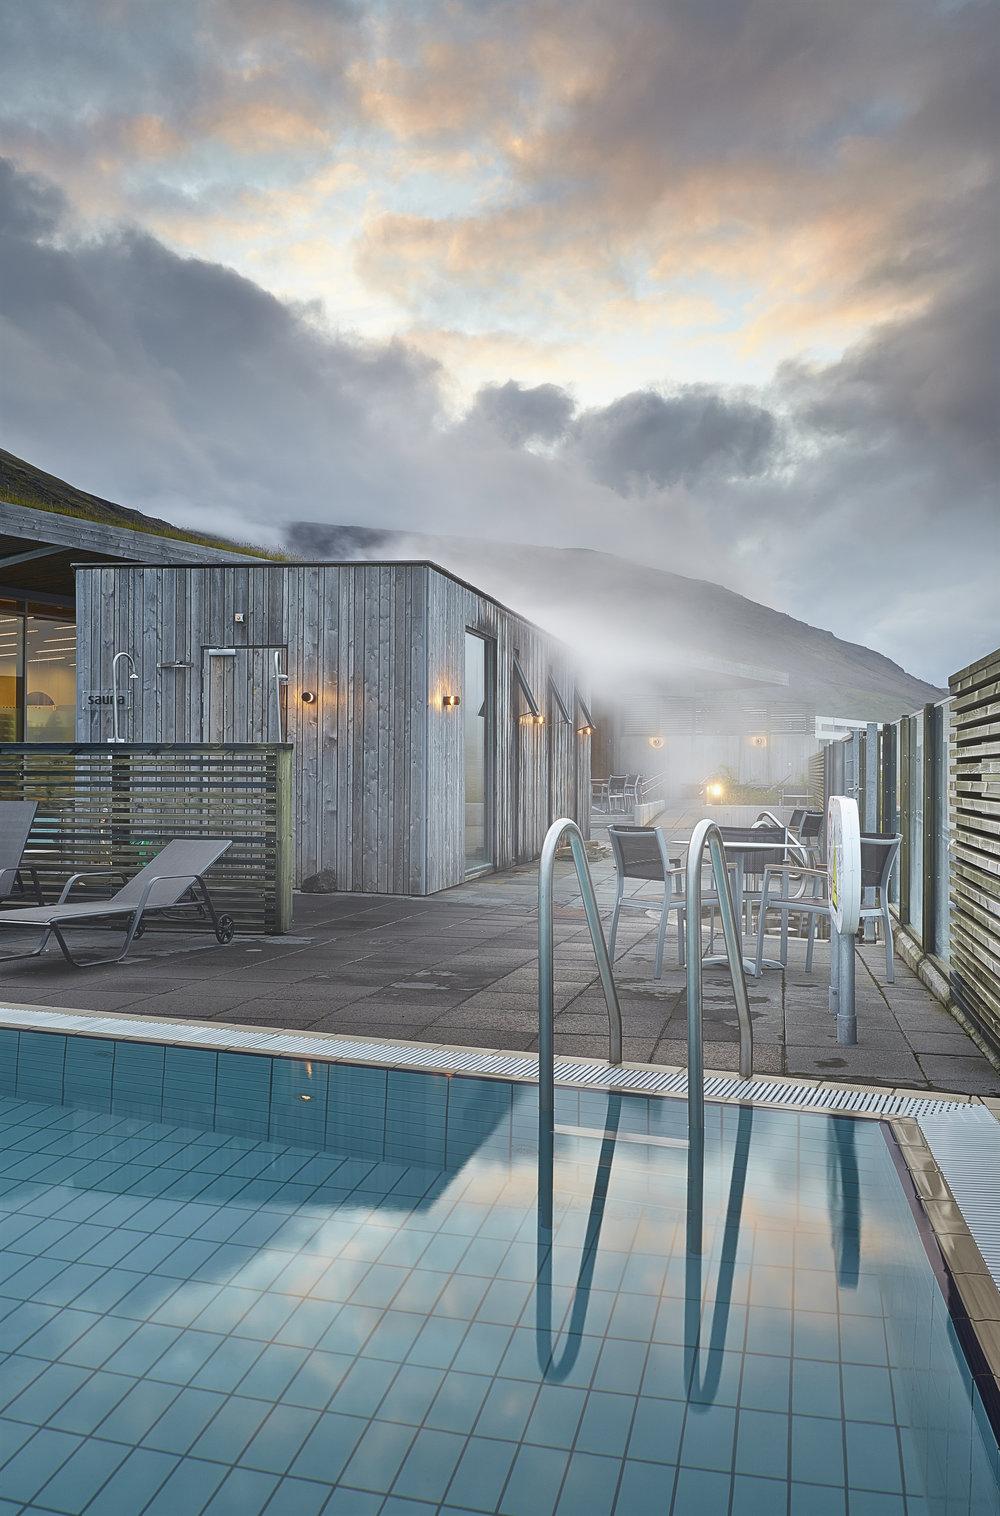 Fontana Geothermal Baths in Laugarvatn, Iceland #Savant -